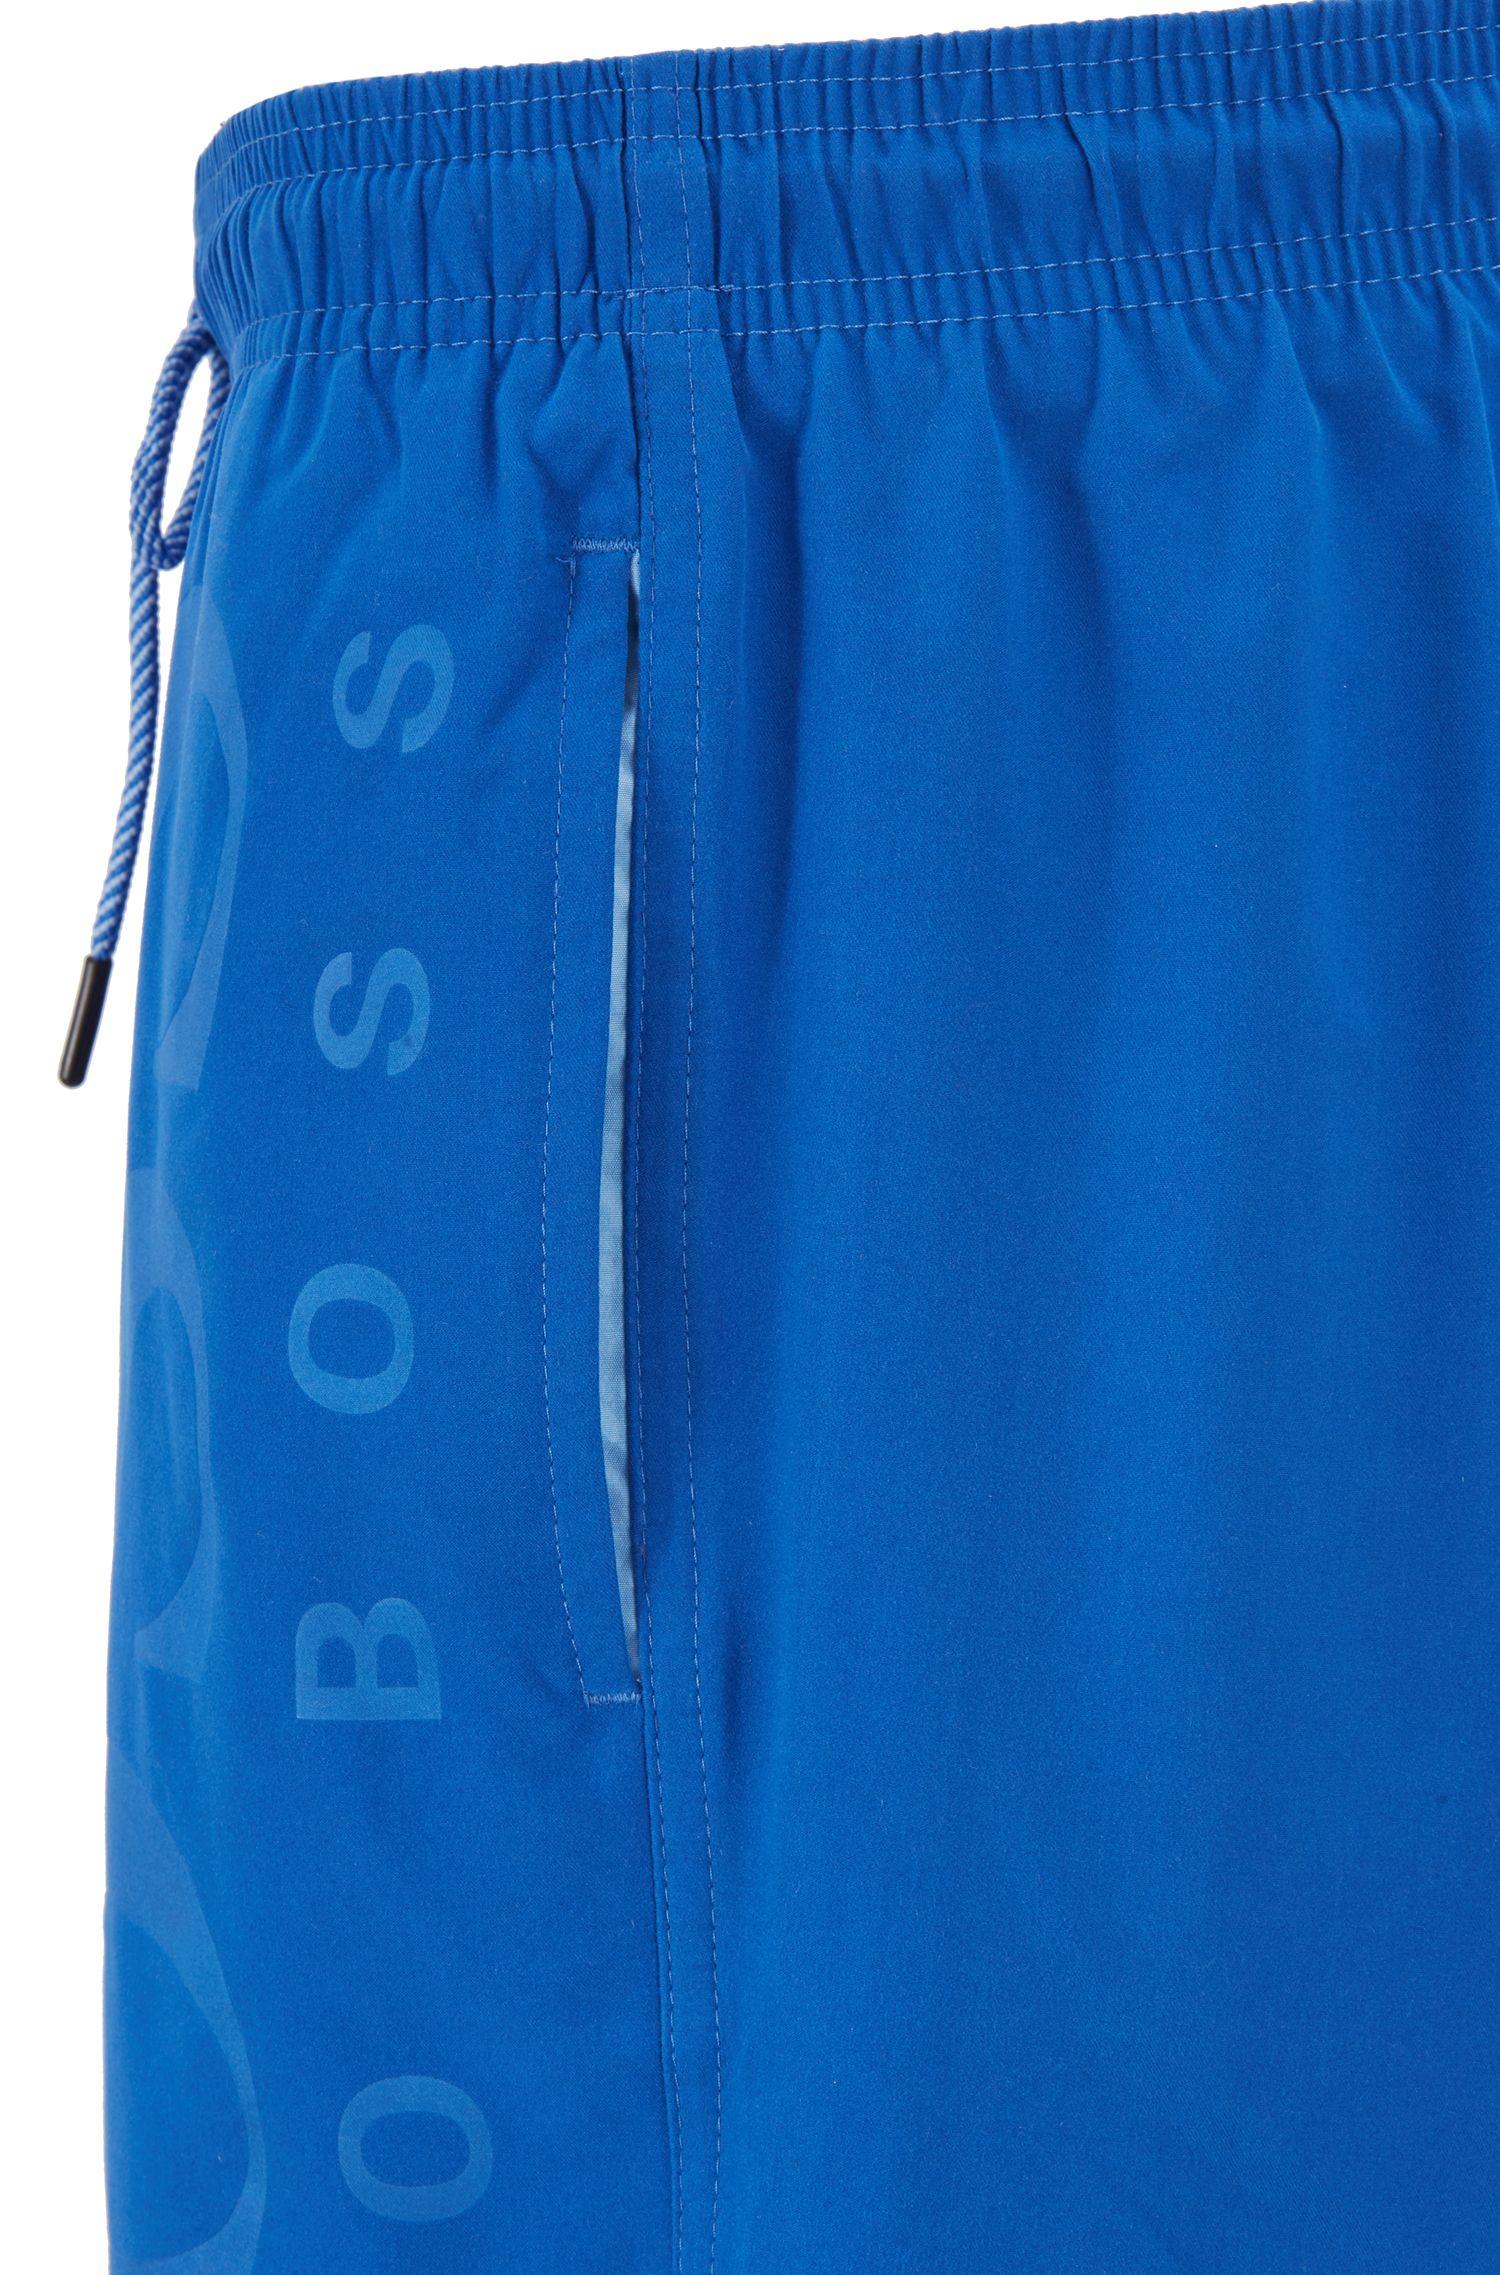 Badeshorts aus gebürstetem Material-Mix, Blau